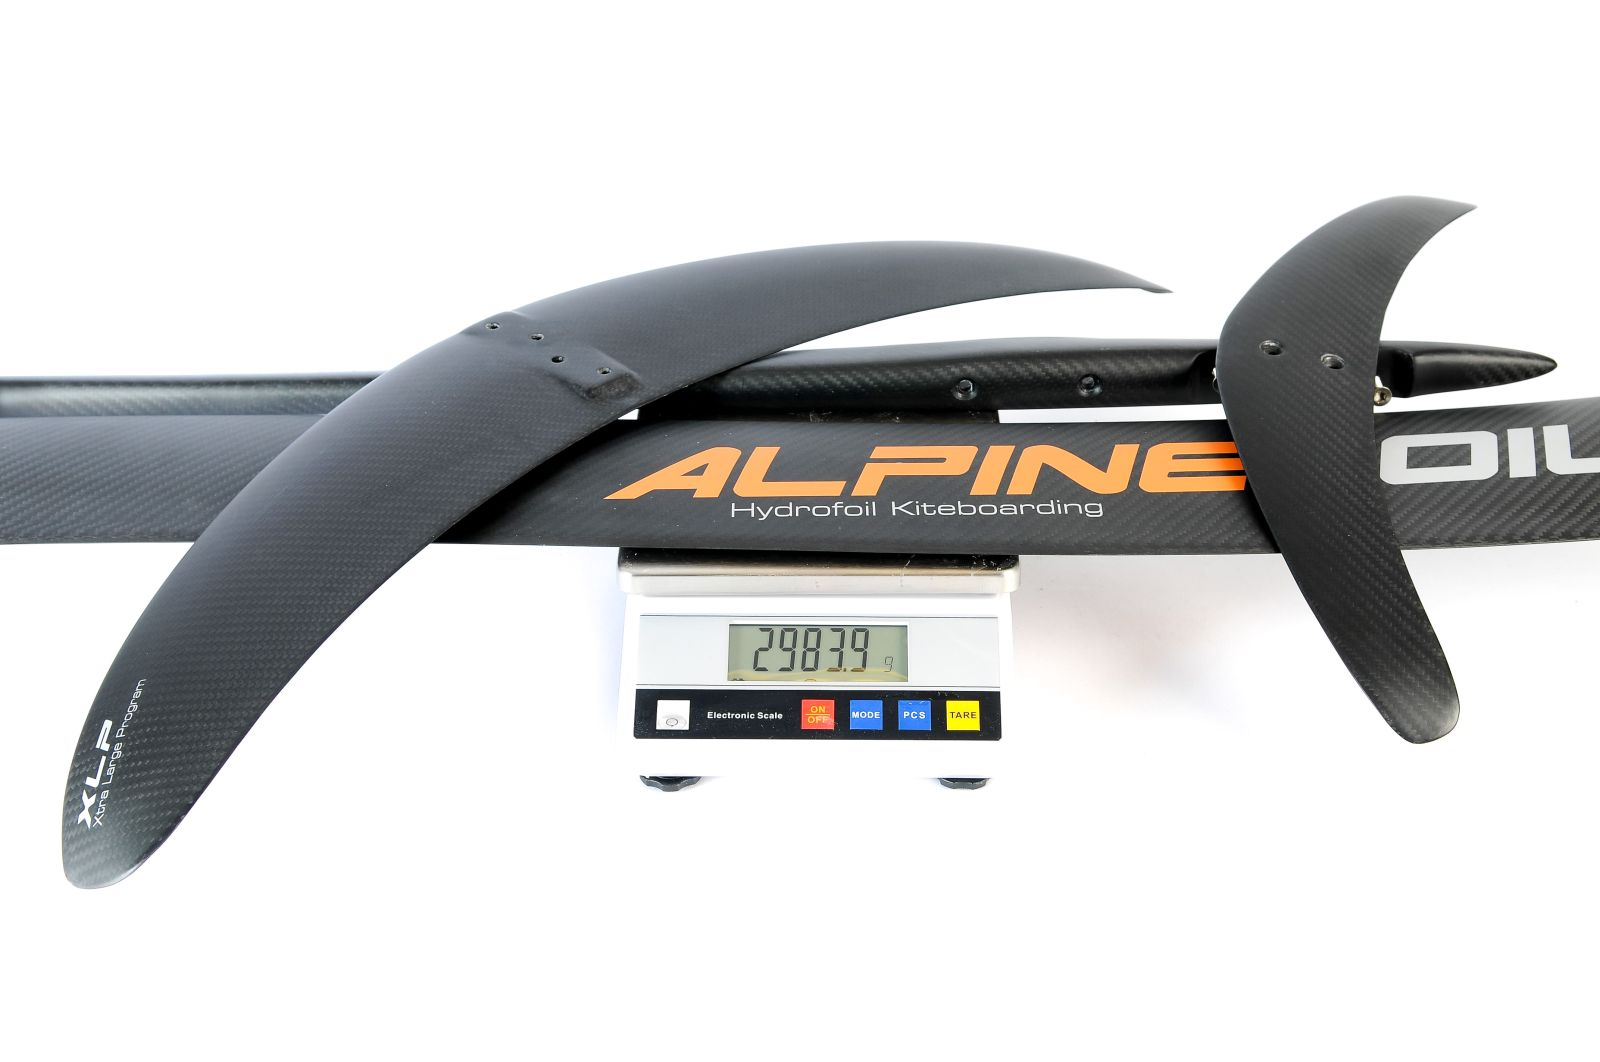 Kitefoil carbon 5 0 alpinefoil hydrofoil foilboard 18612420 1